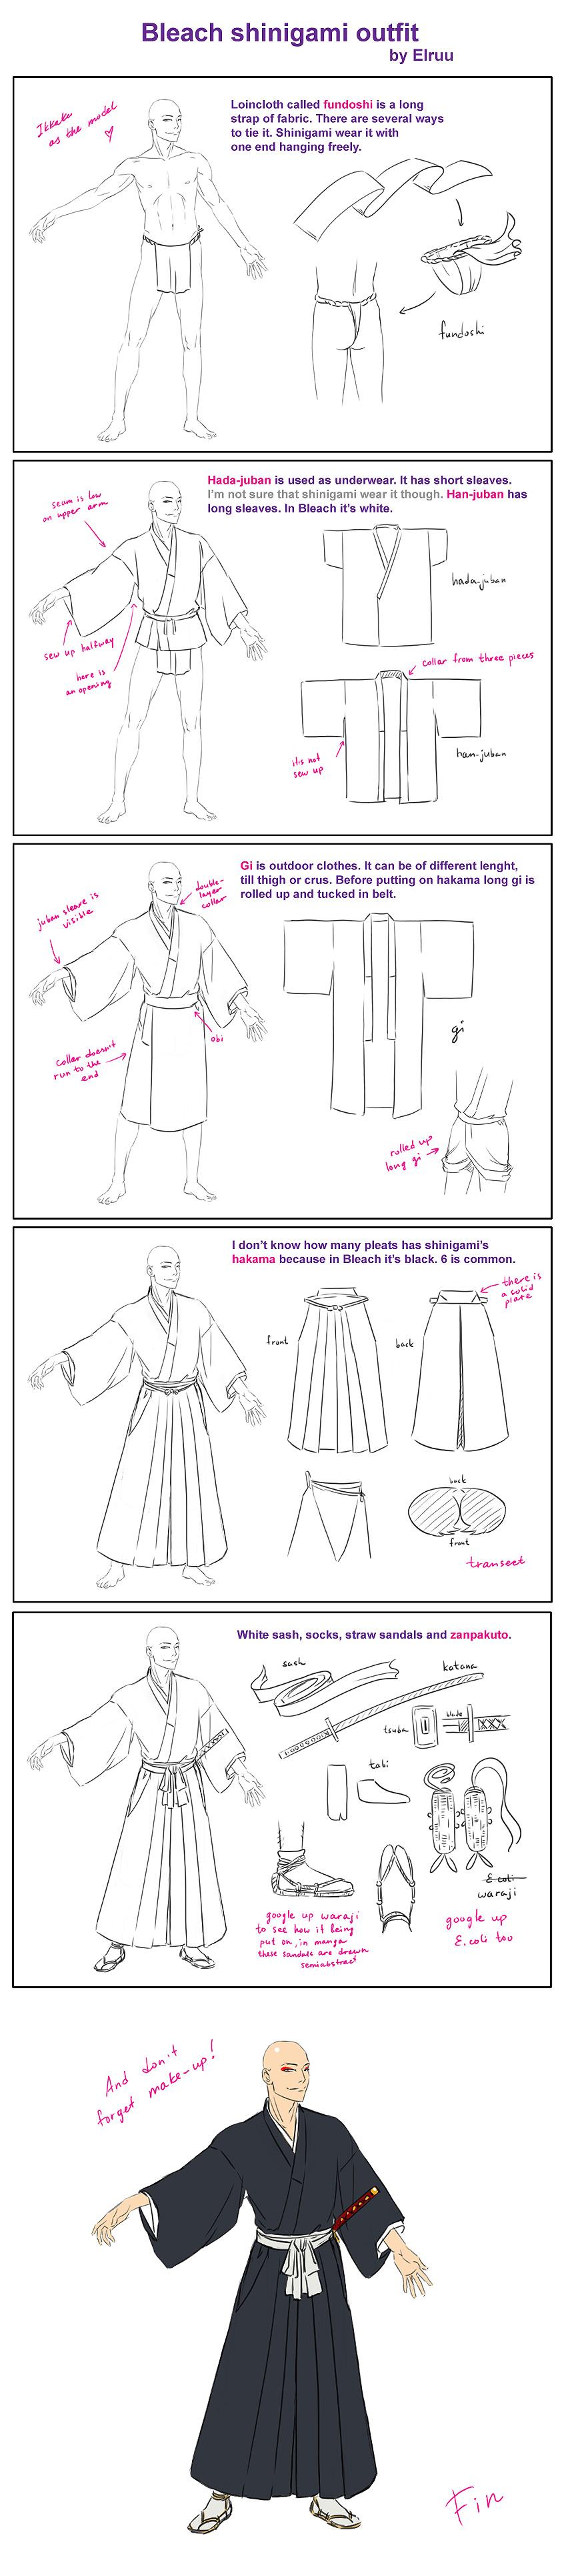 Bleach shinigami outfit